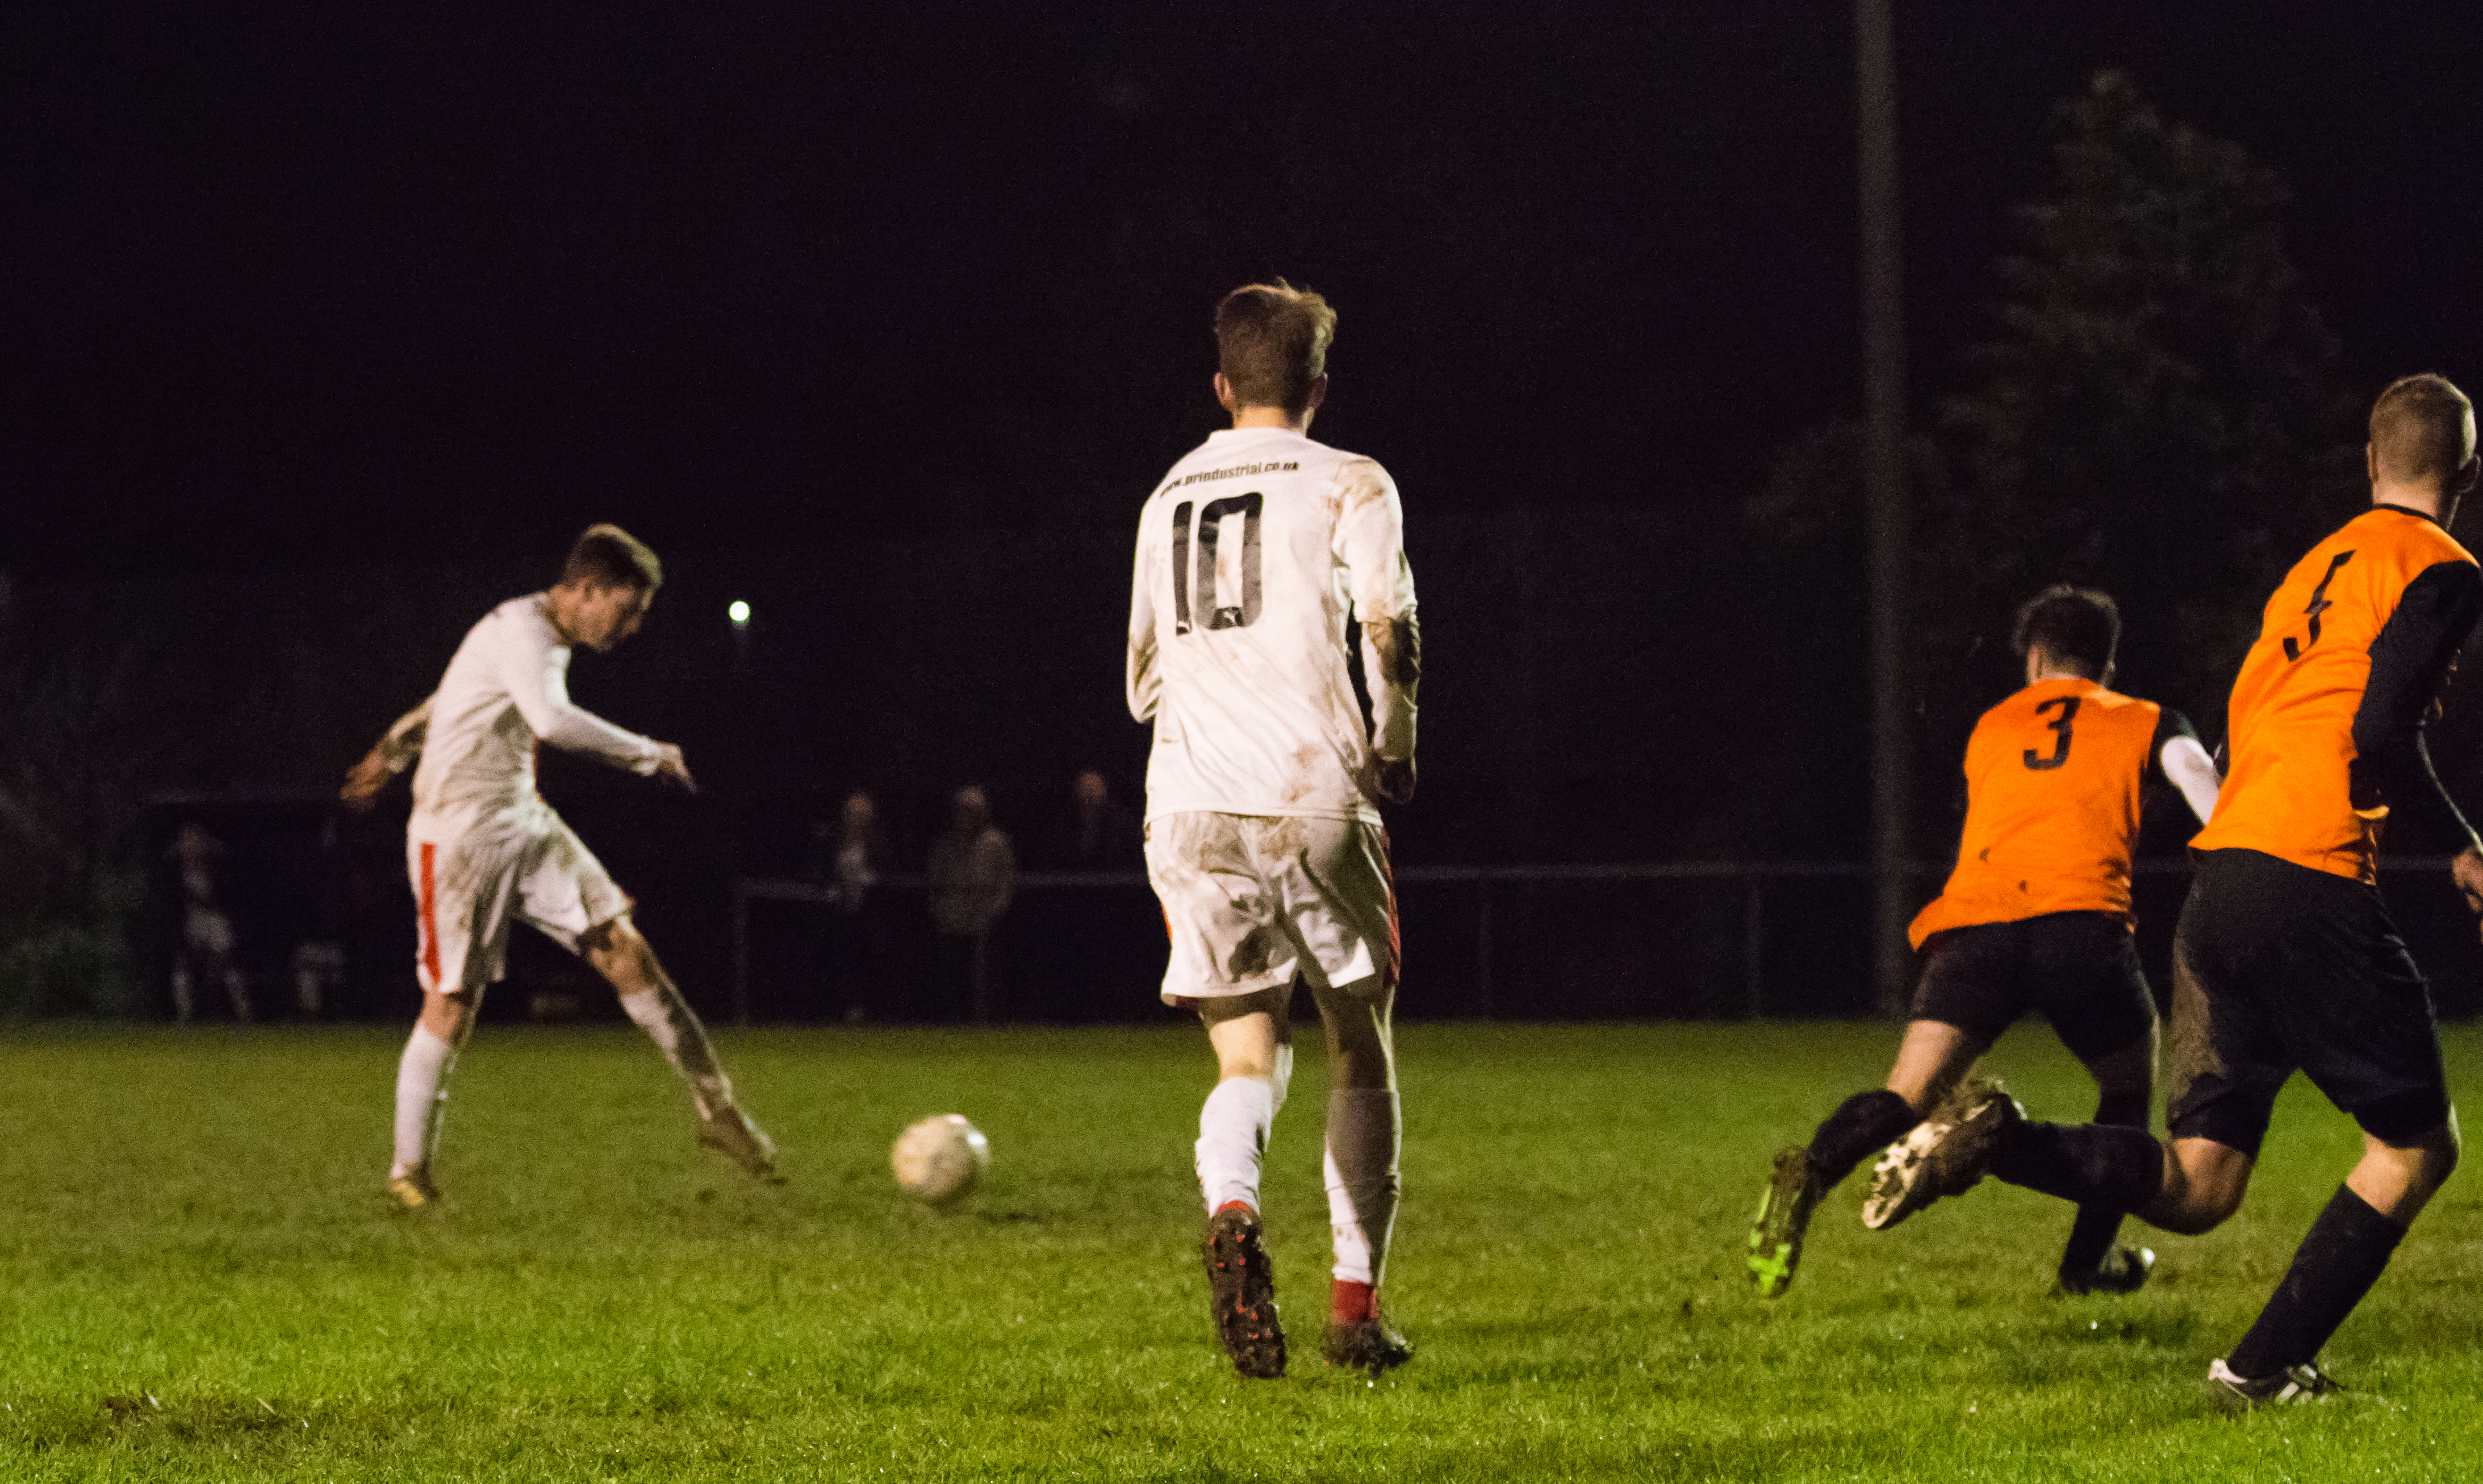 Mile Oak U21s vs Southwick FC U21s 14.12.17 40